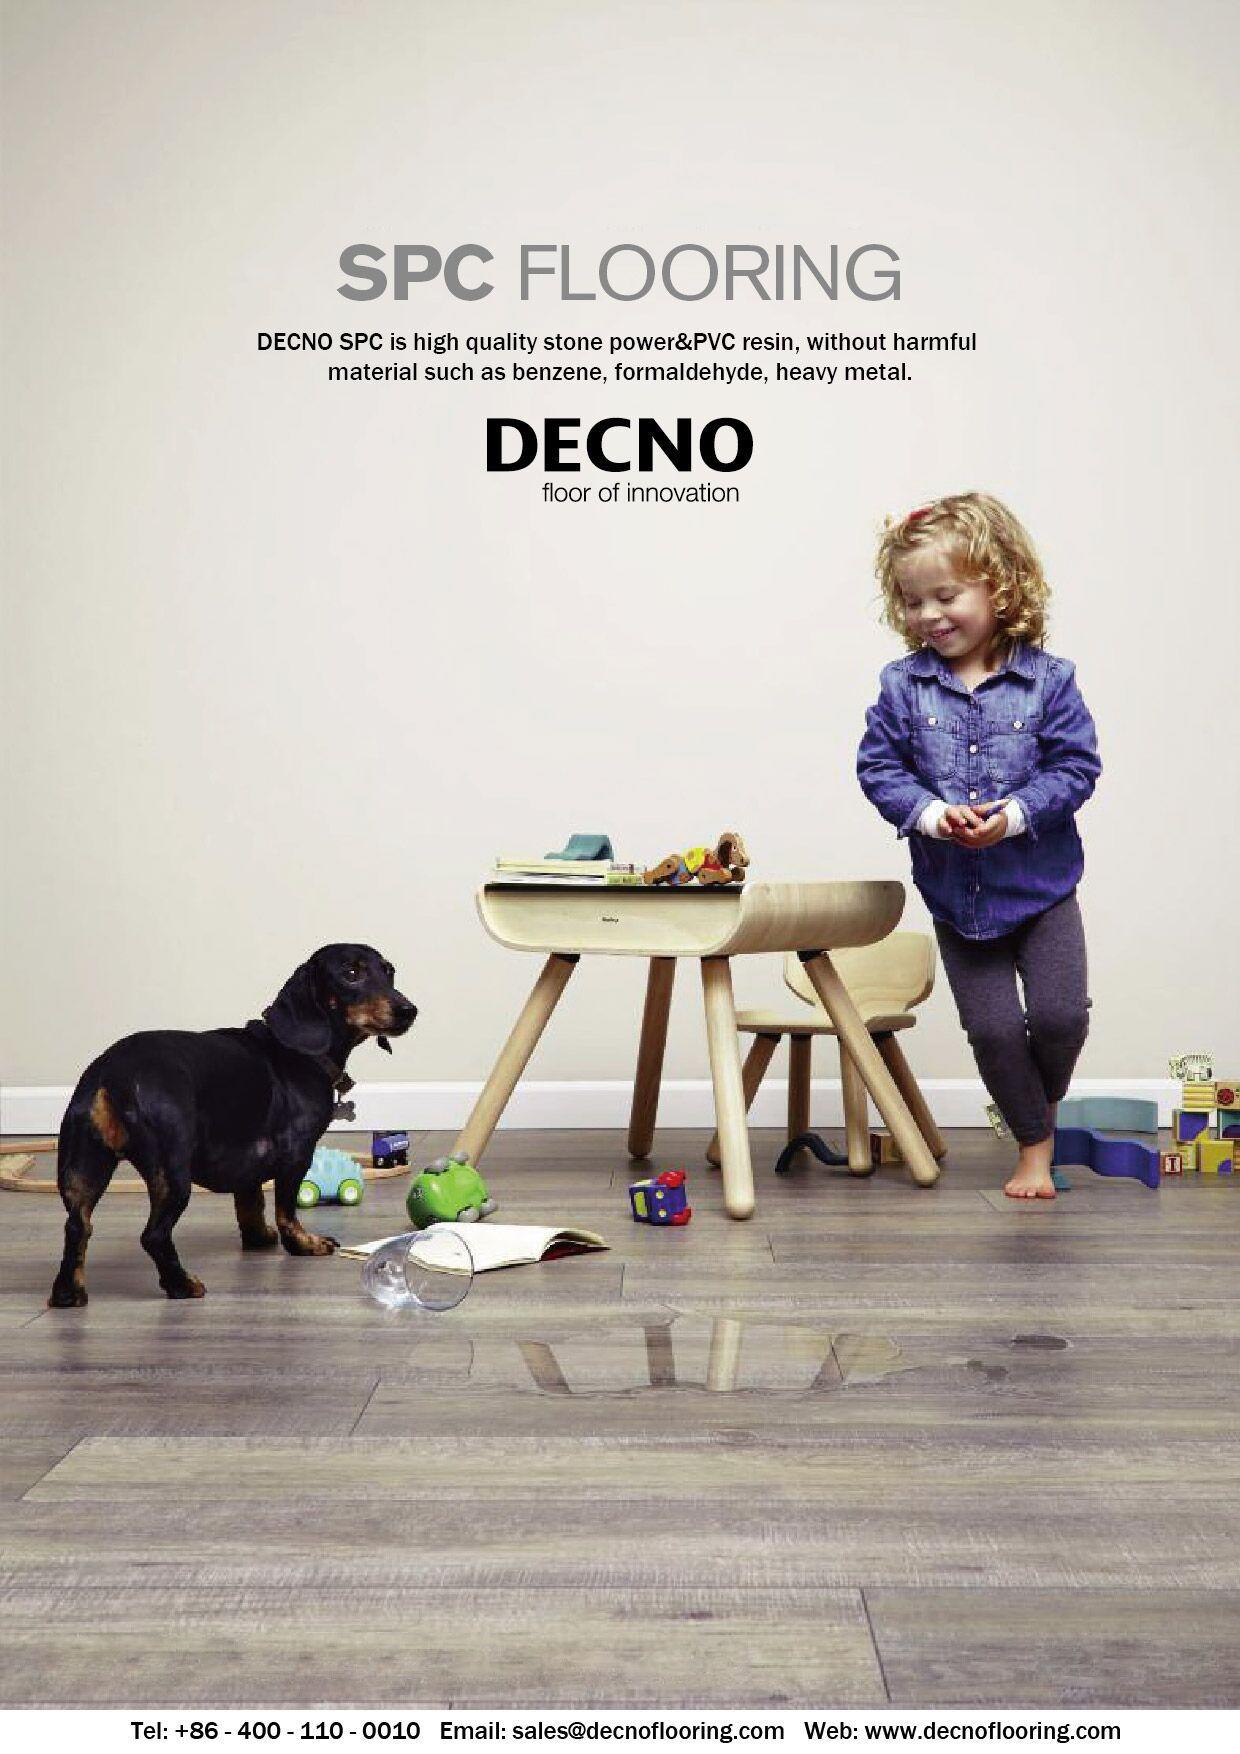 Spc Flooring Rigid Core Flooring Beautiful Visuals Perfect Floor Decno Spc Rigid Floor Diamotm Is The Ne Vinyl Flooring Flooring Waterproof Flooring Vinyls